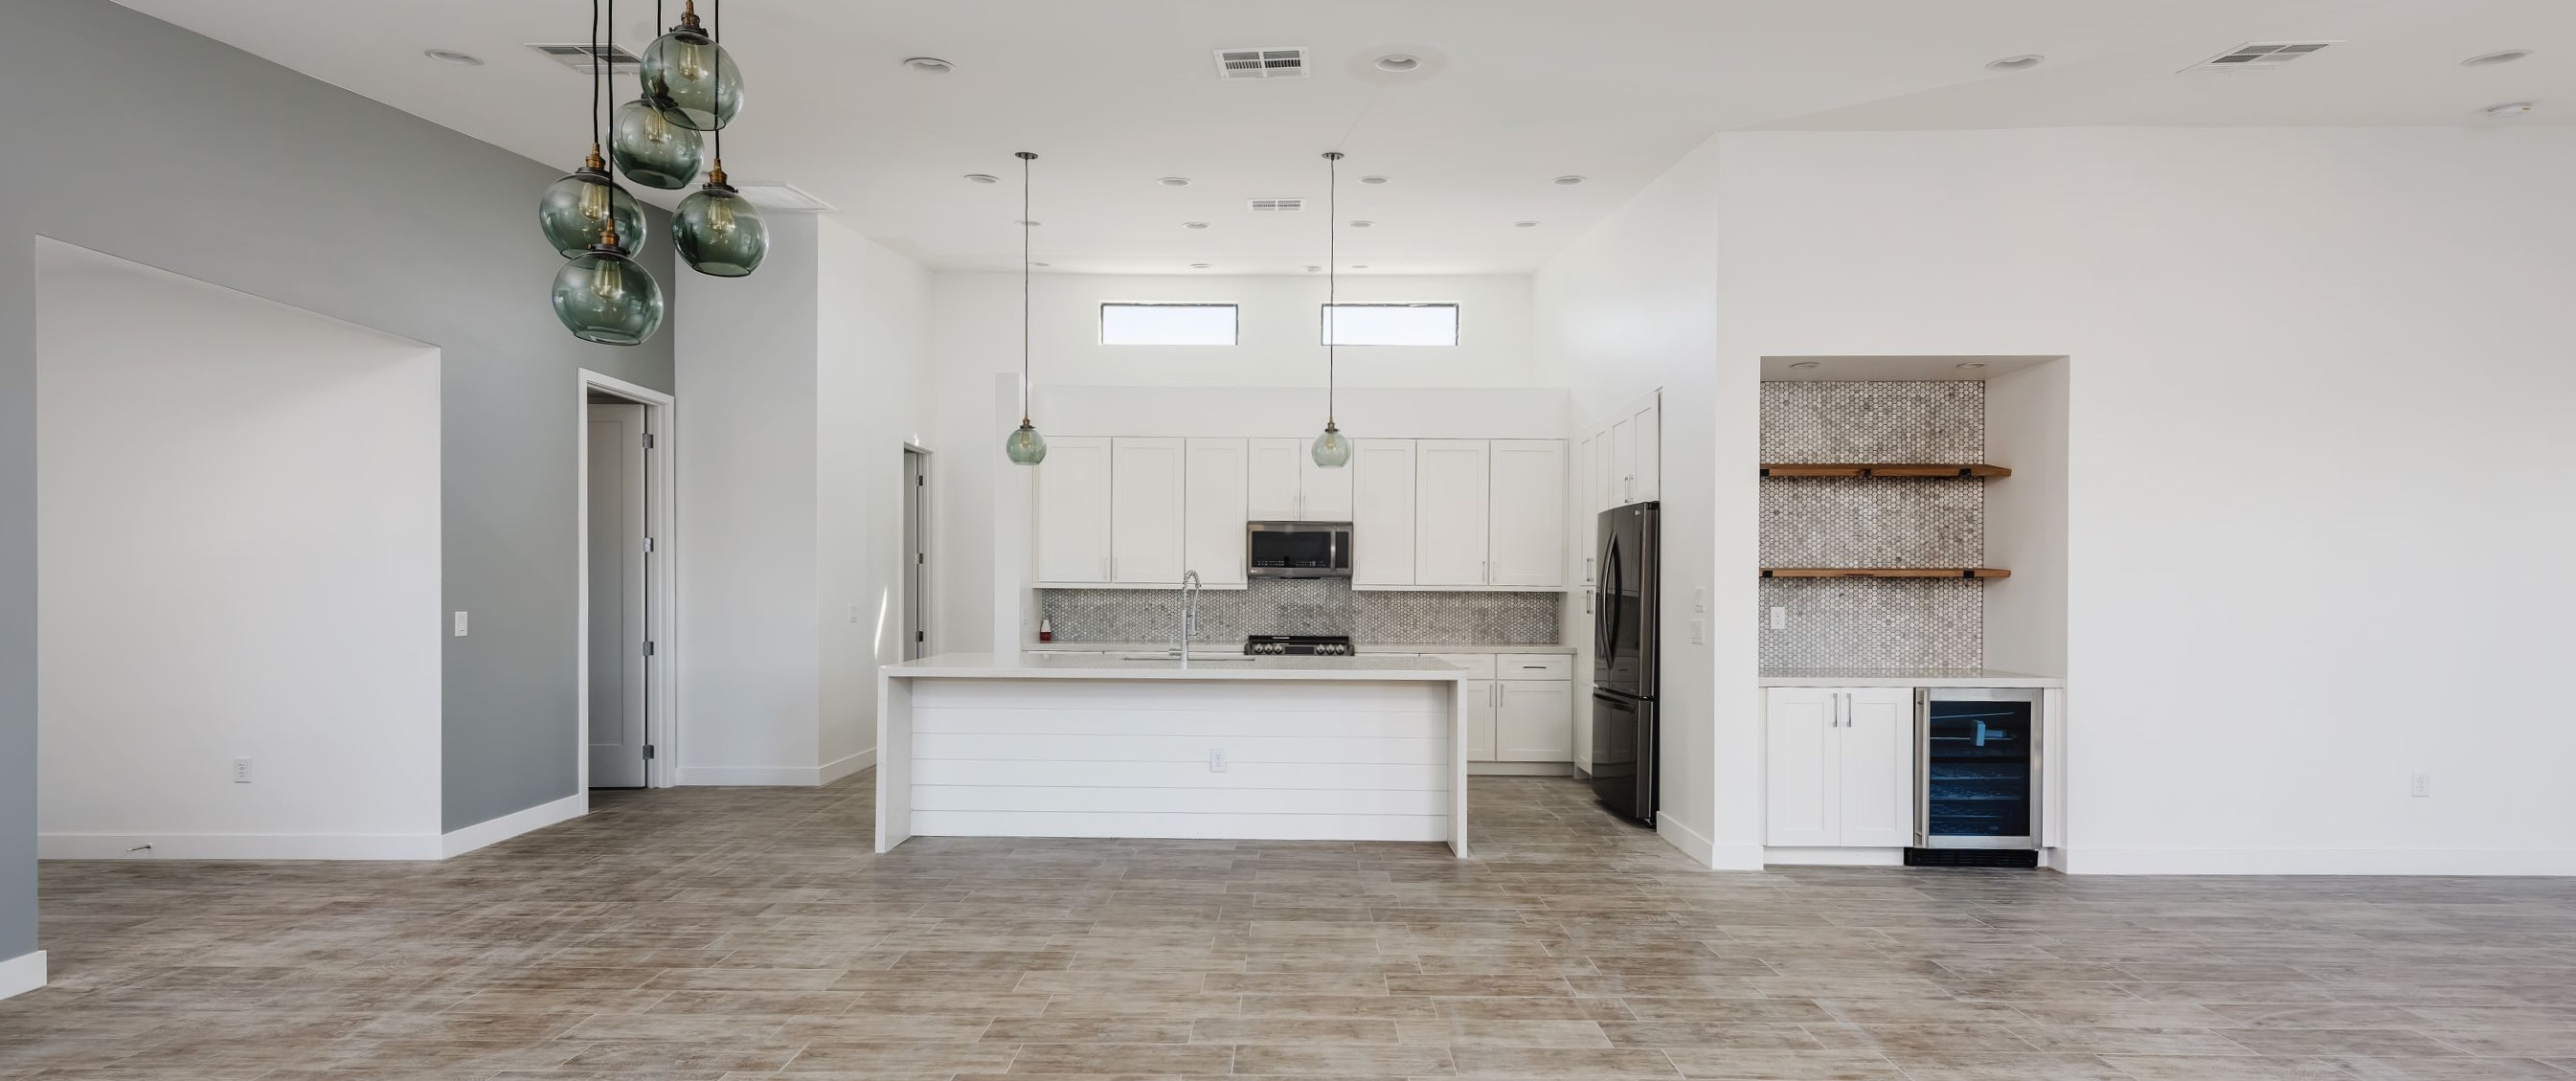 4234 N 18th Pl, Phoenix, AZ 85016 | Home For Sale In Biltmore Phoenix